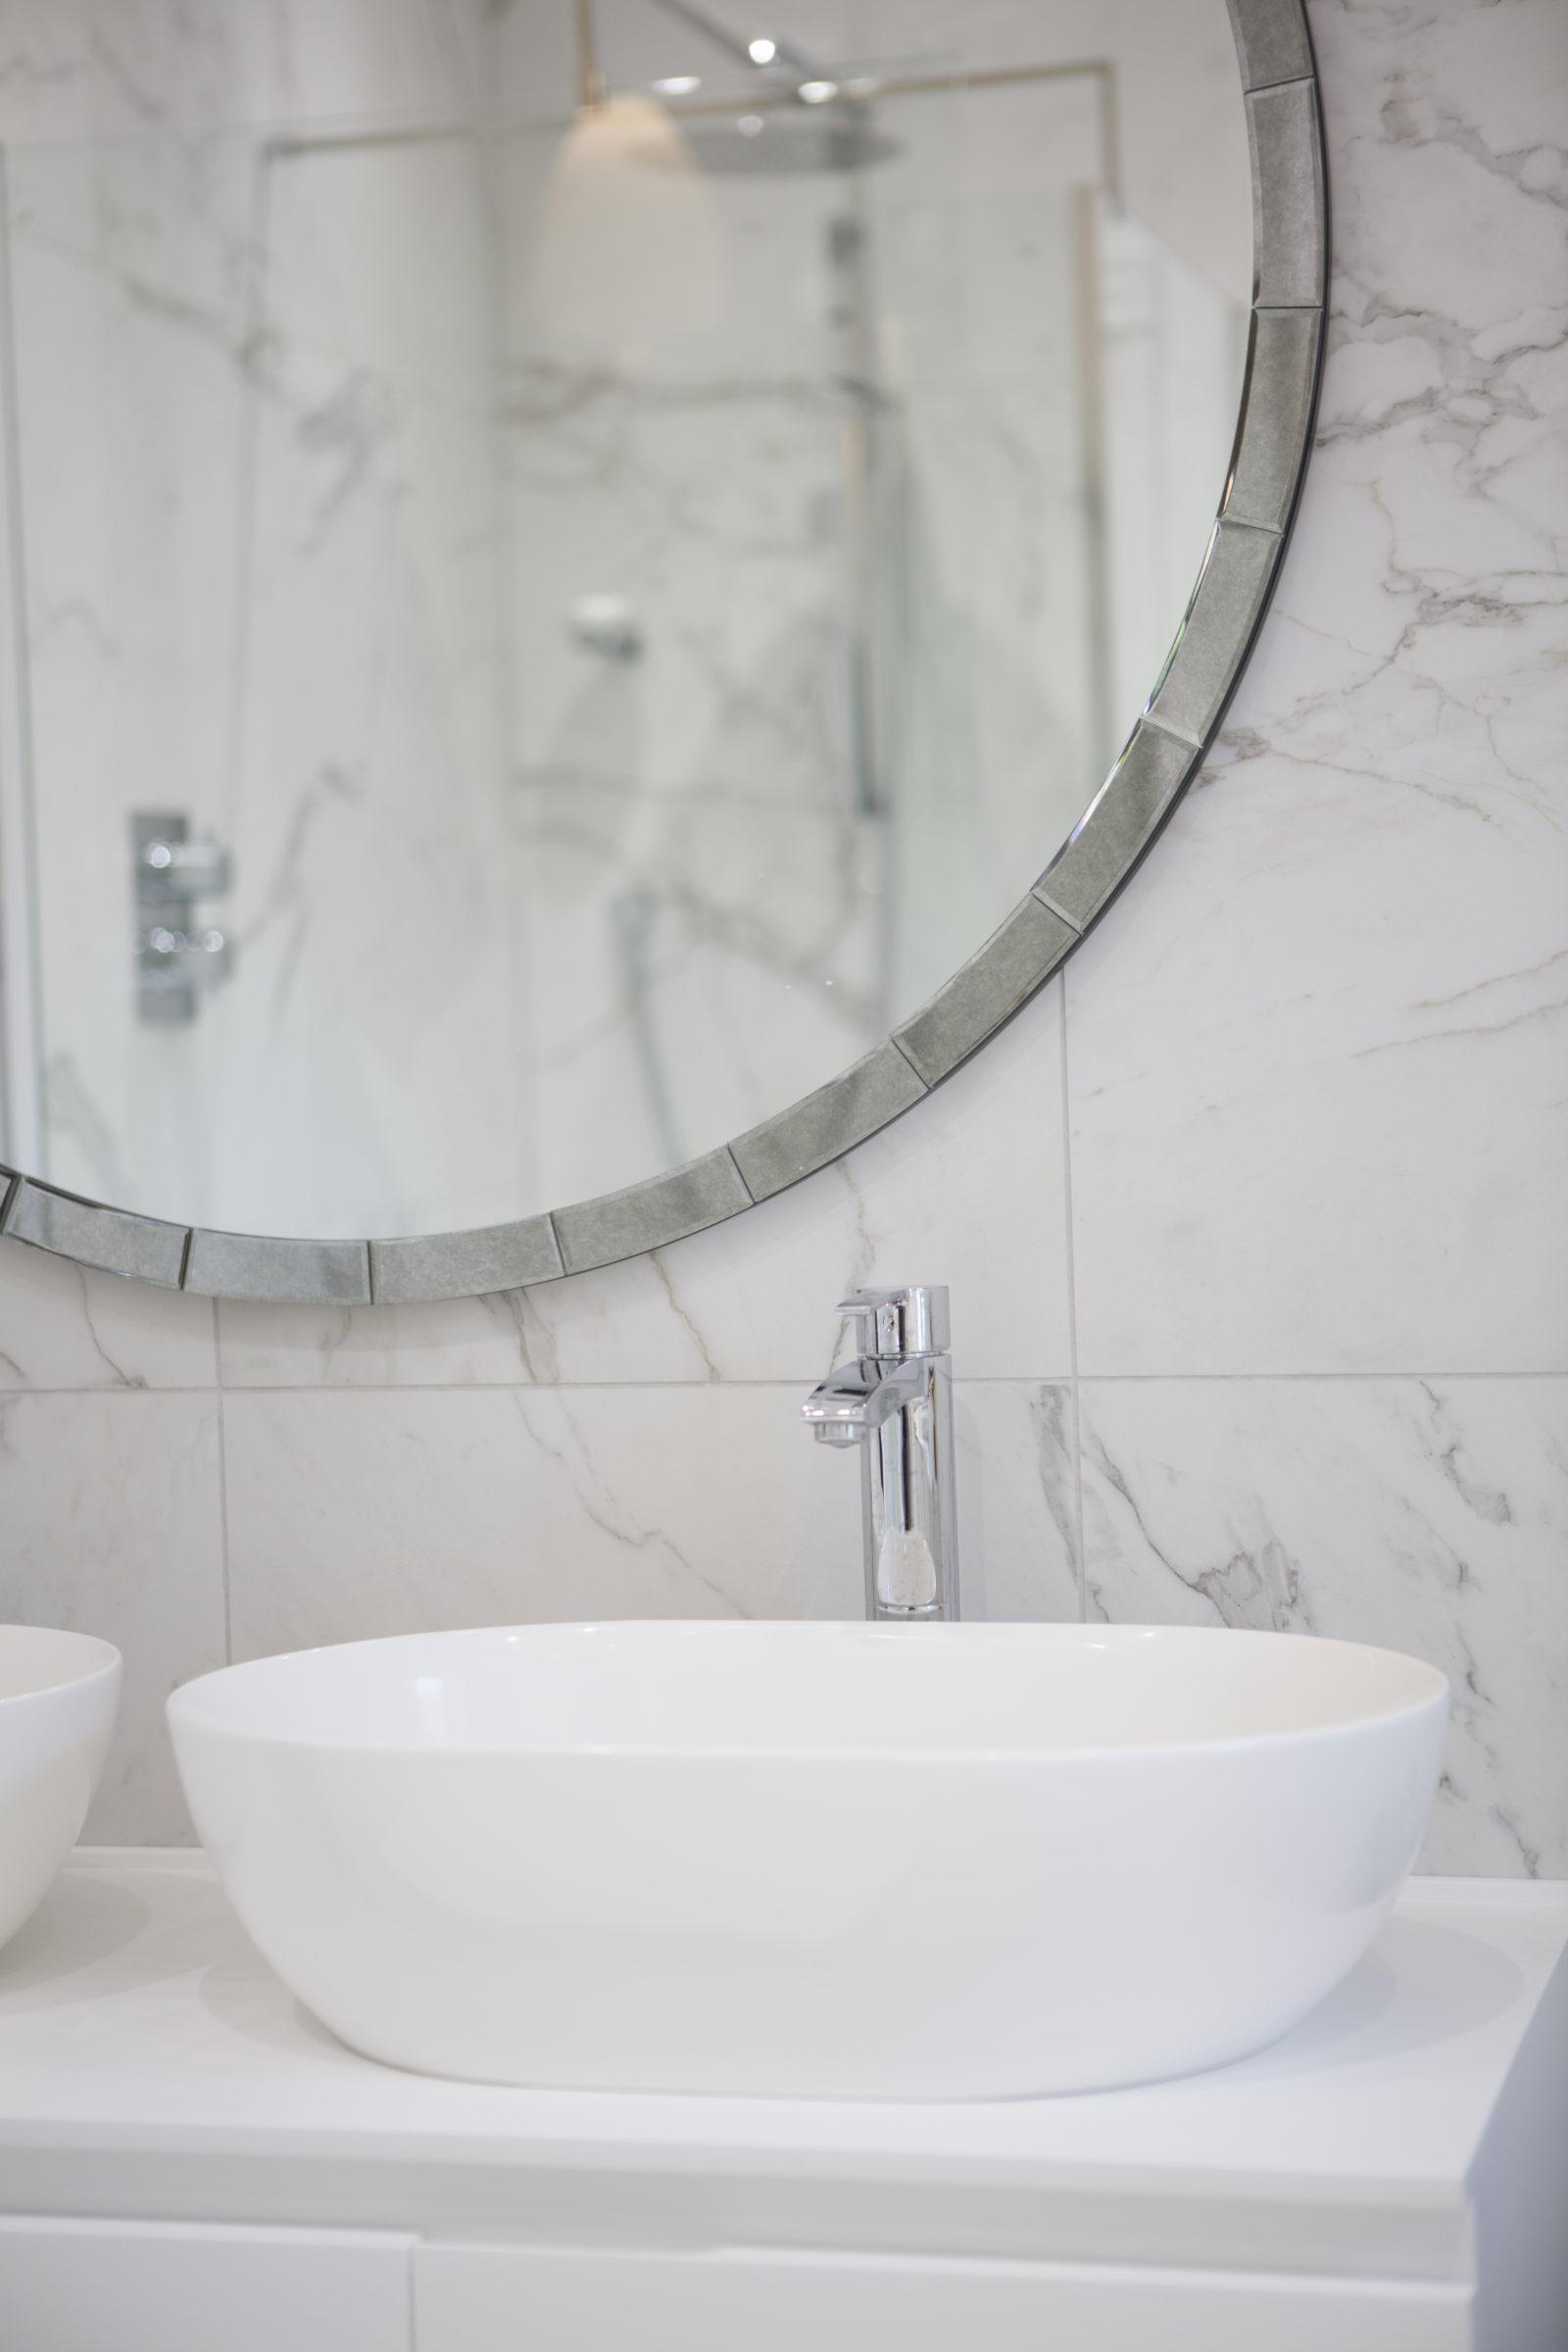 Bespoke fitted modern bathroom designs Berkshire, interior designer Oxfordshire, small bathroom interior design, master bathroom refurbishment, home decor, interior stylist, interior designer London, bespoke bathrooms Oxfordshire, bespoke fitted bathrooms Buckingham, bathrooms London, interior designer UK, interior psychology UK